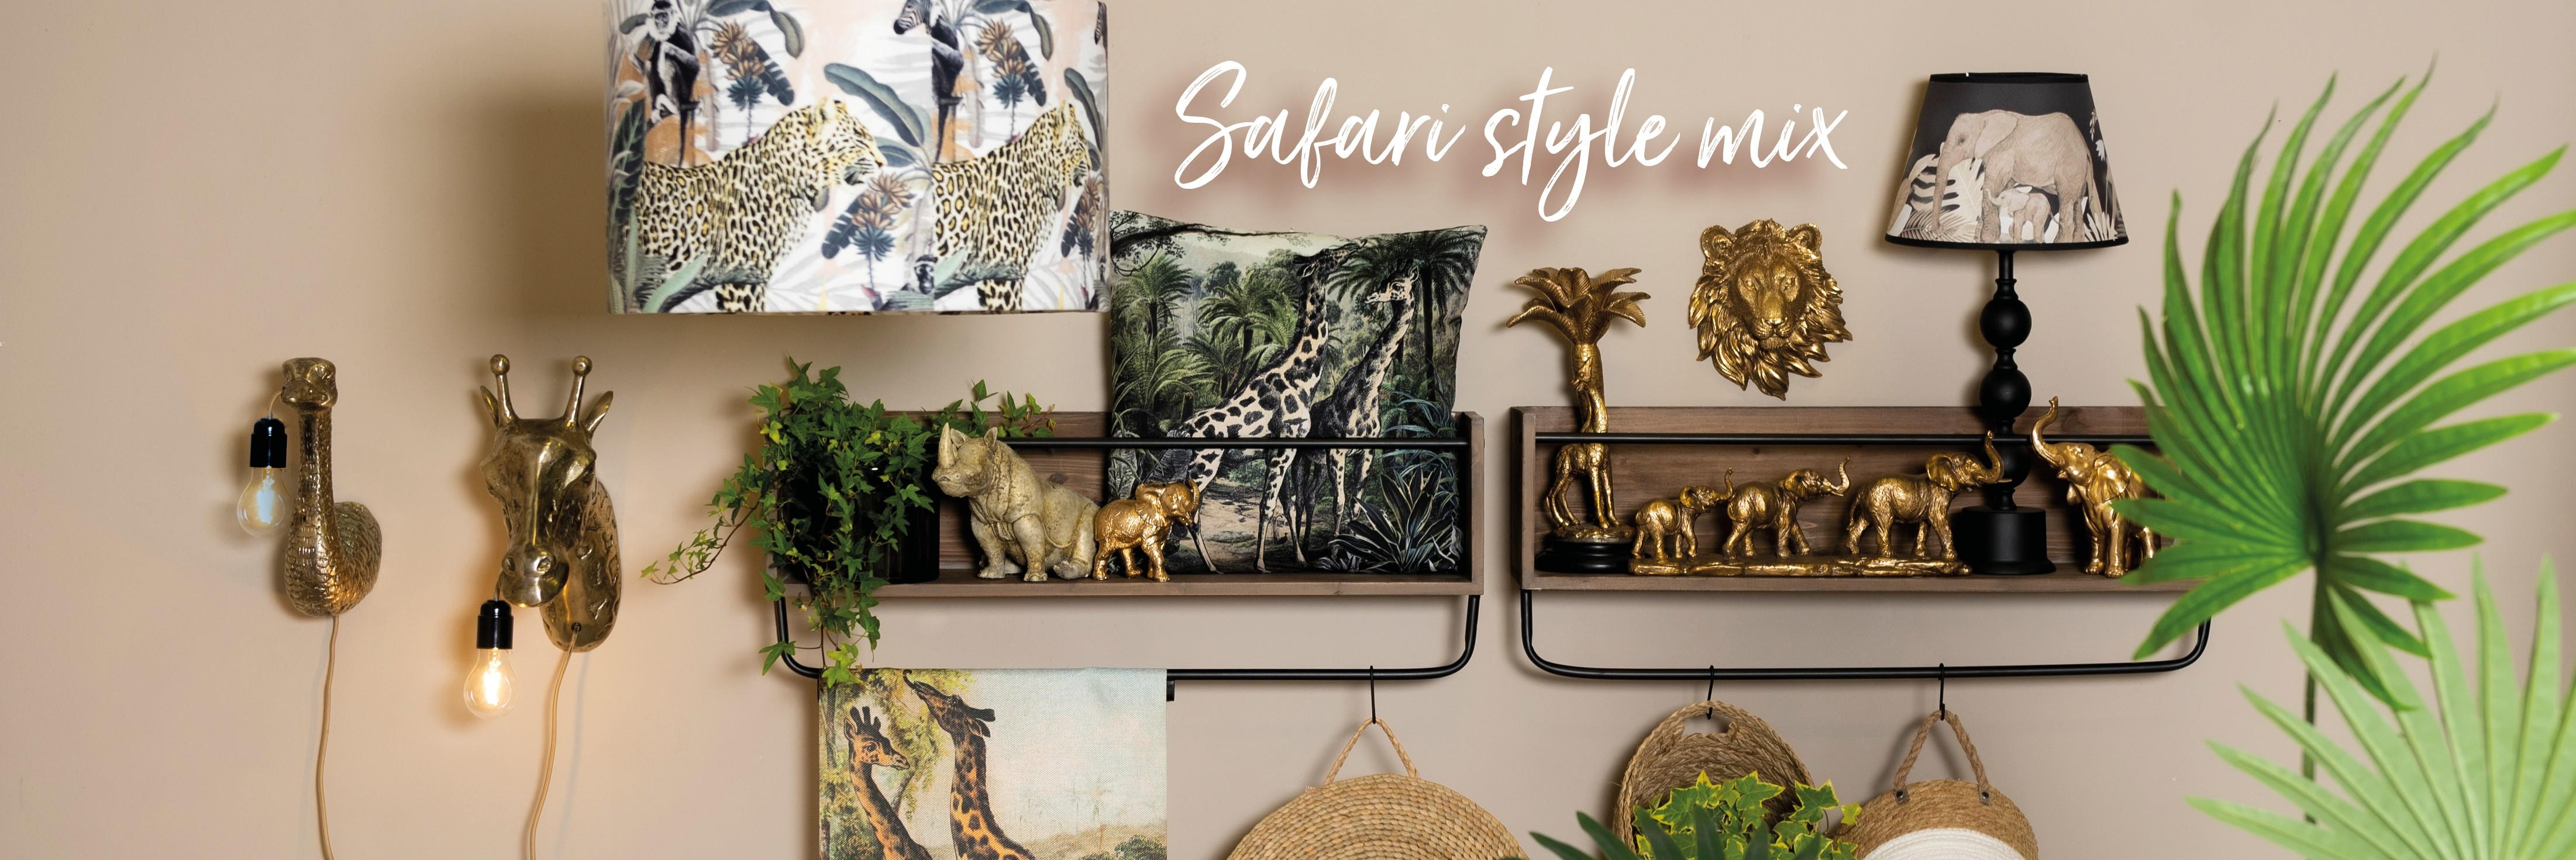 Safari style mix